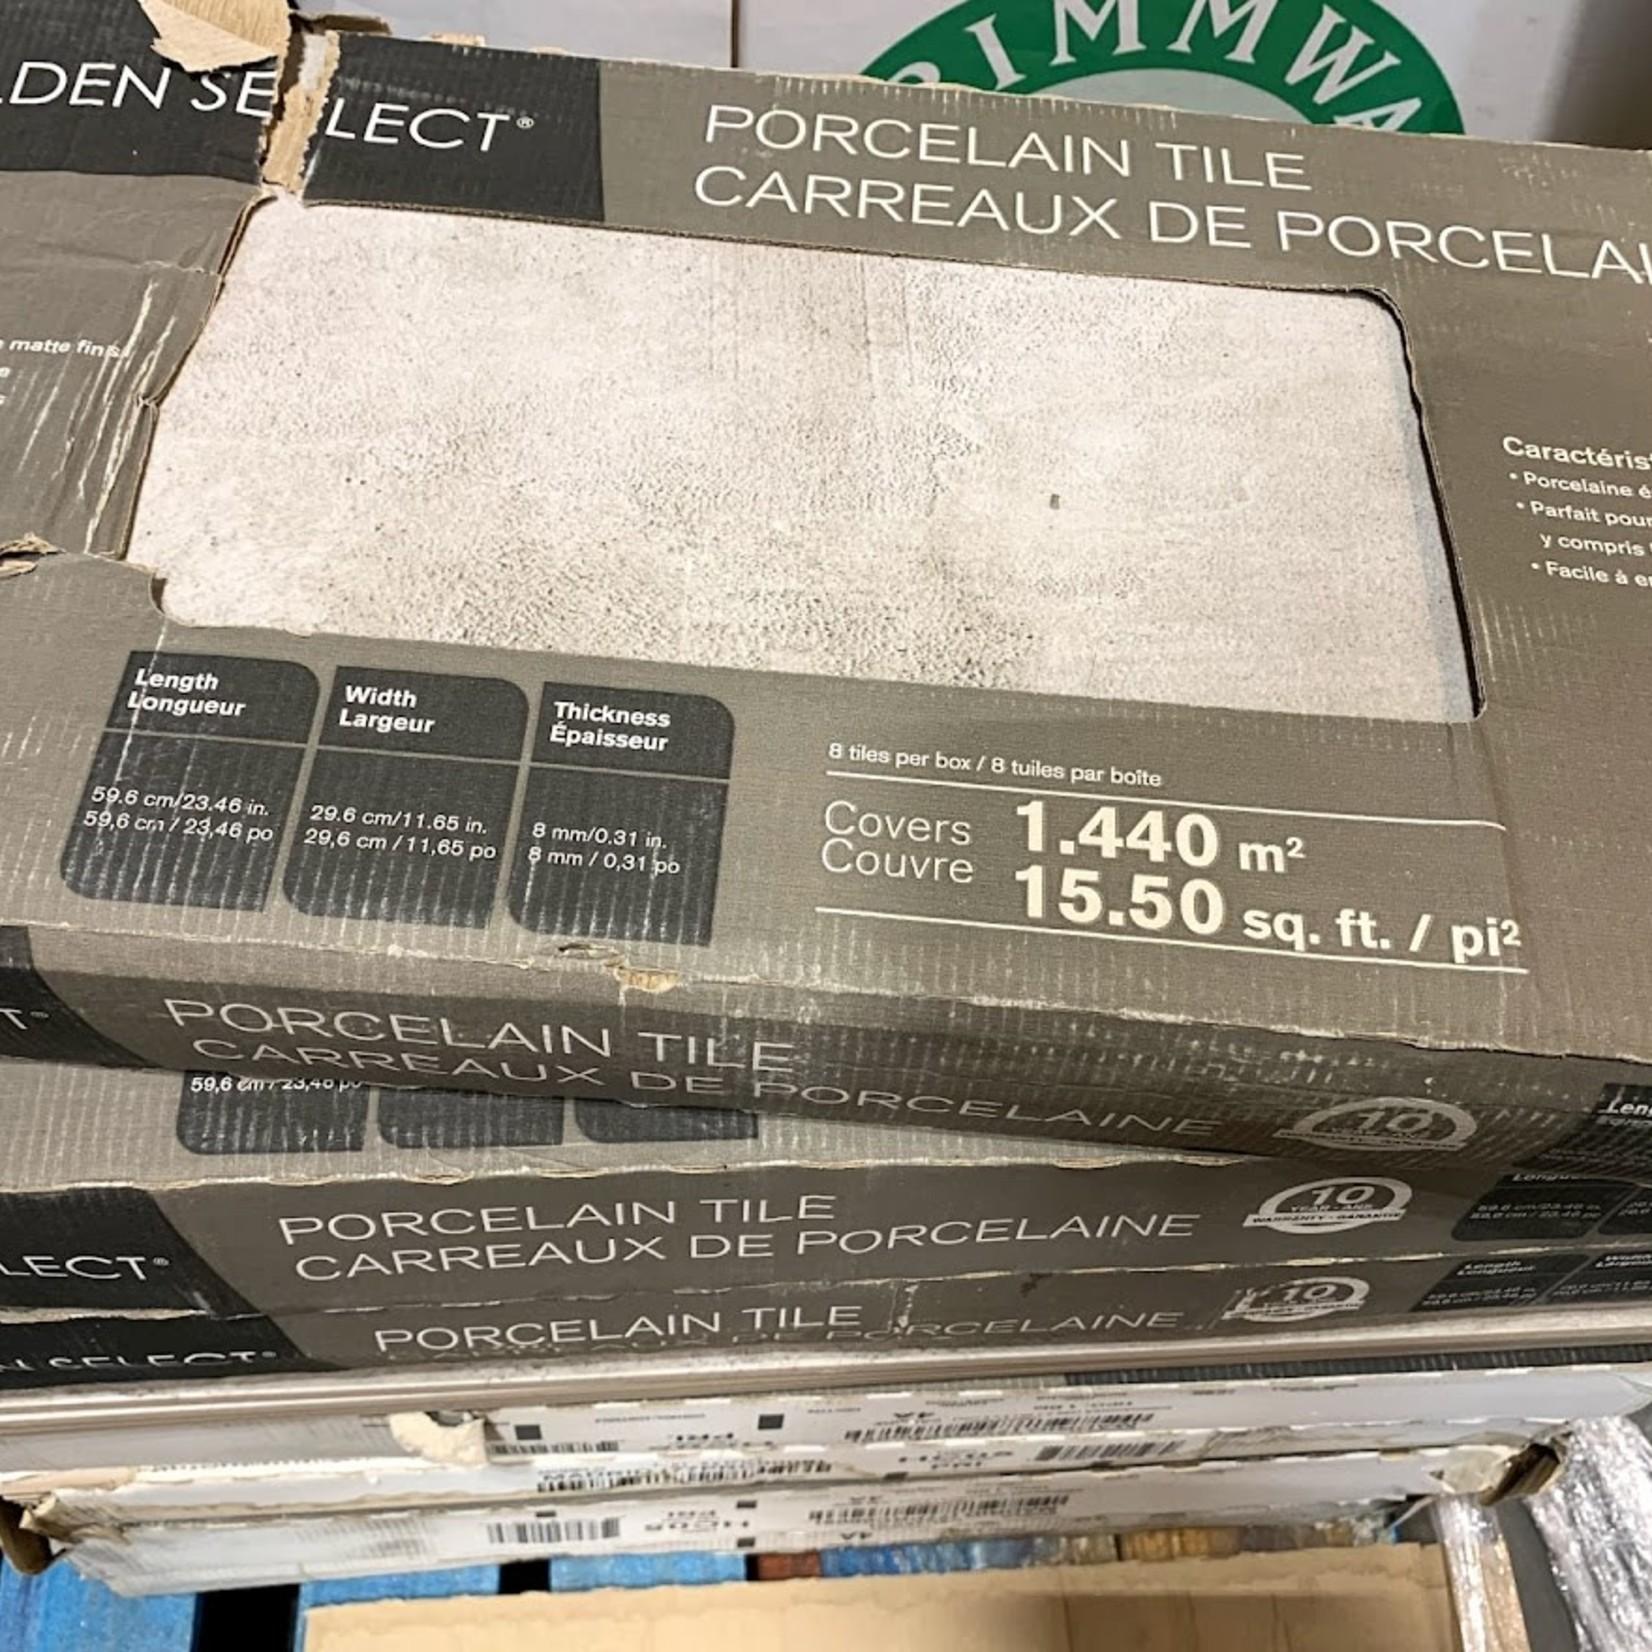 "Golden Select Porcelain Tile 23.46""x11.65""x0.31"" (Box of 8 Tiles) 15.50 Sq.Ft."